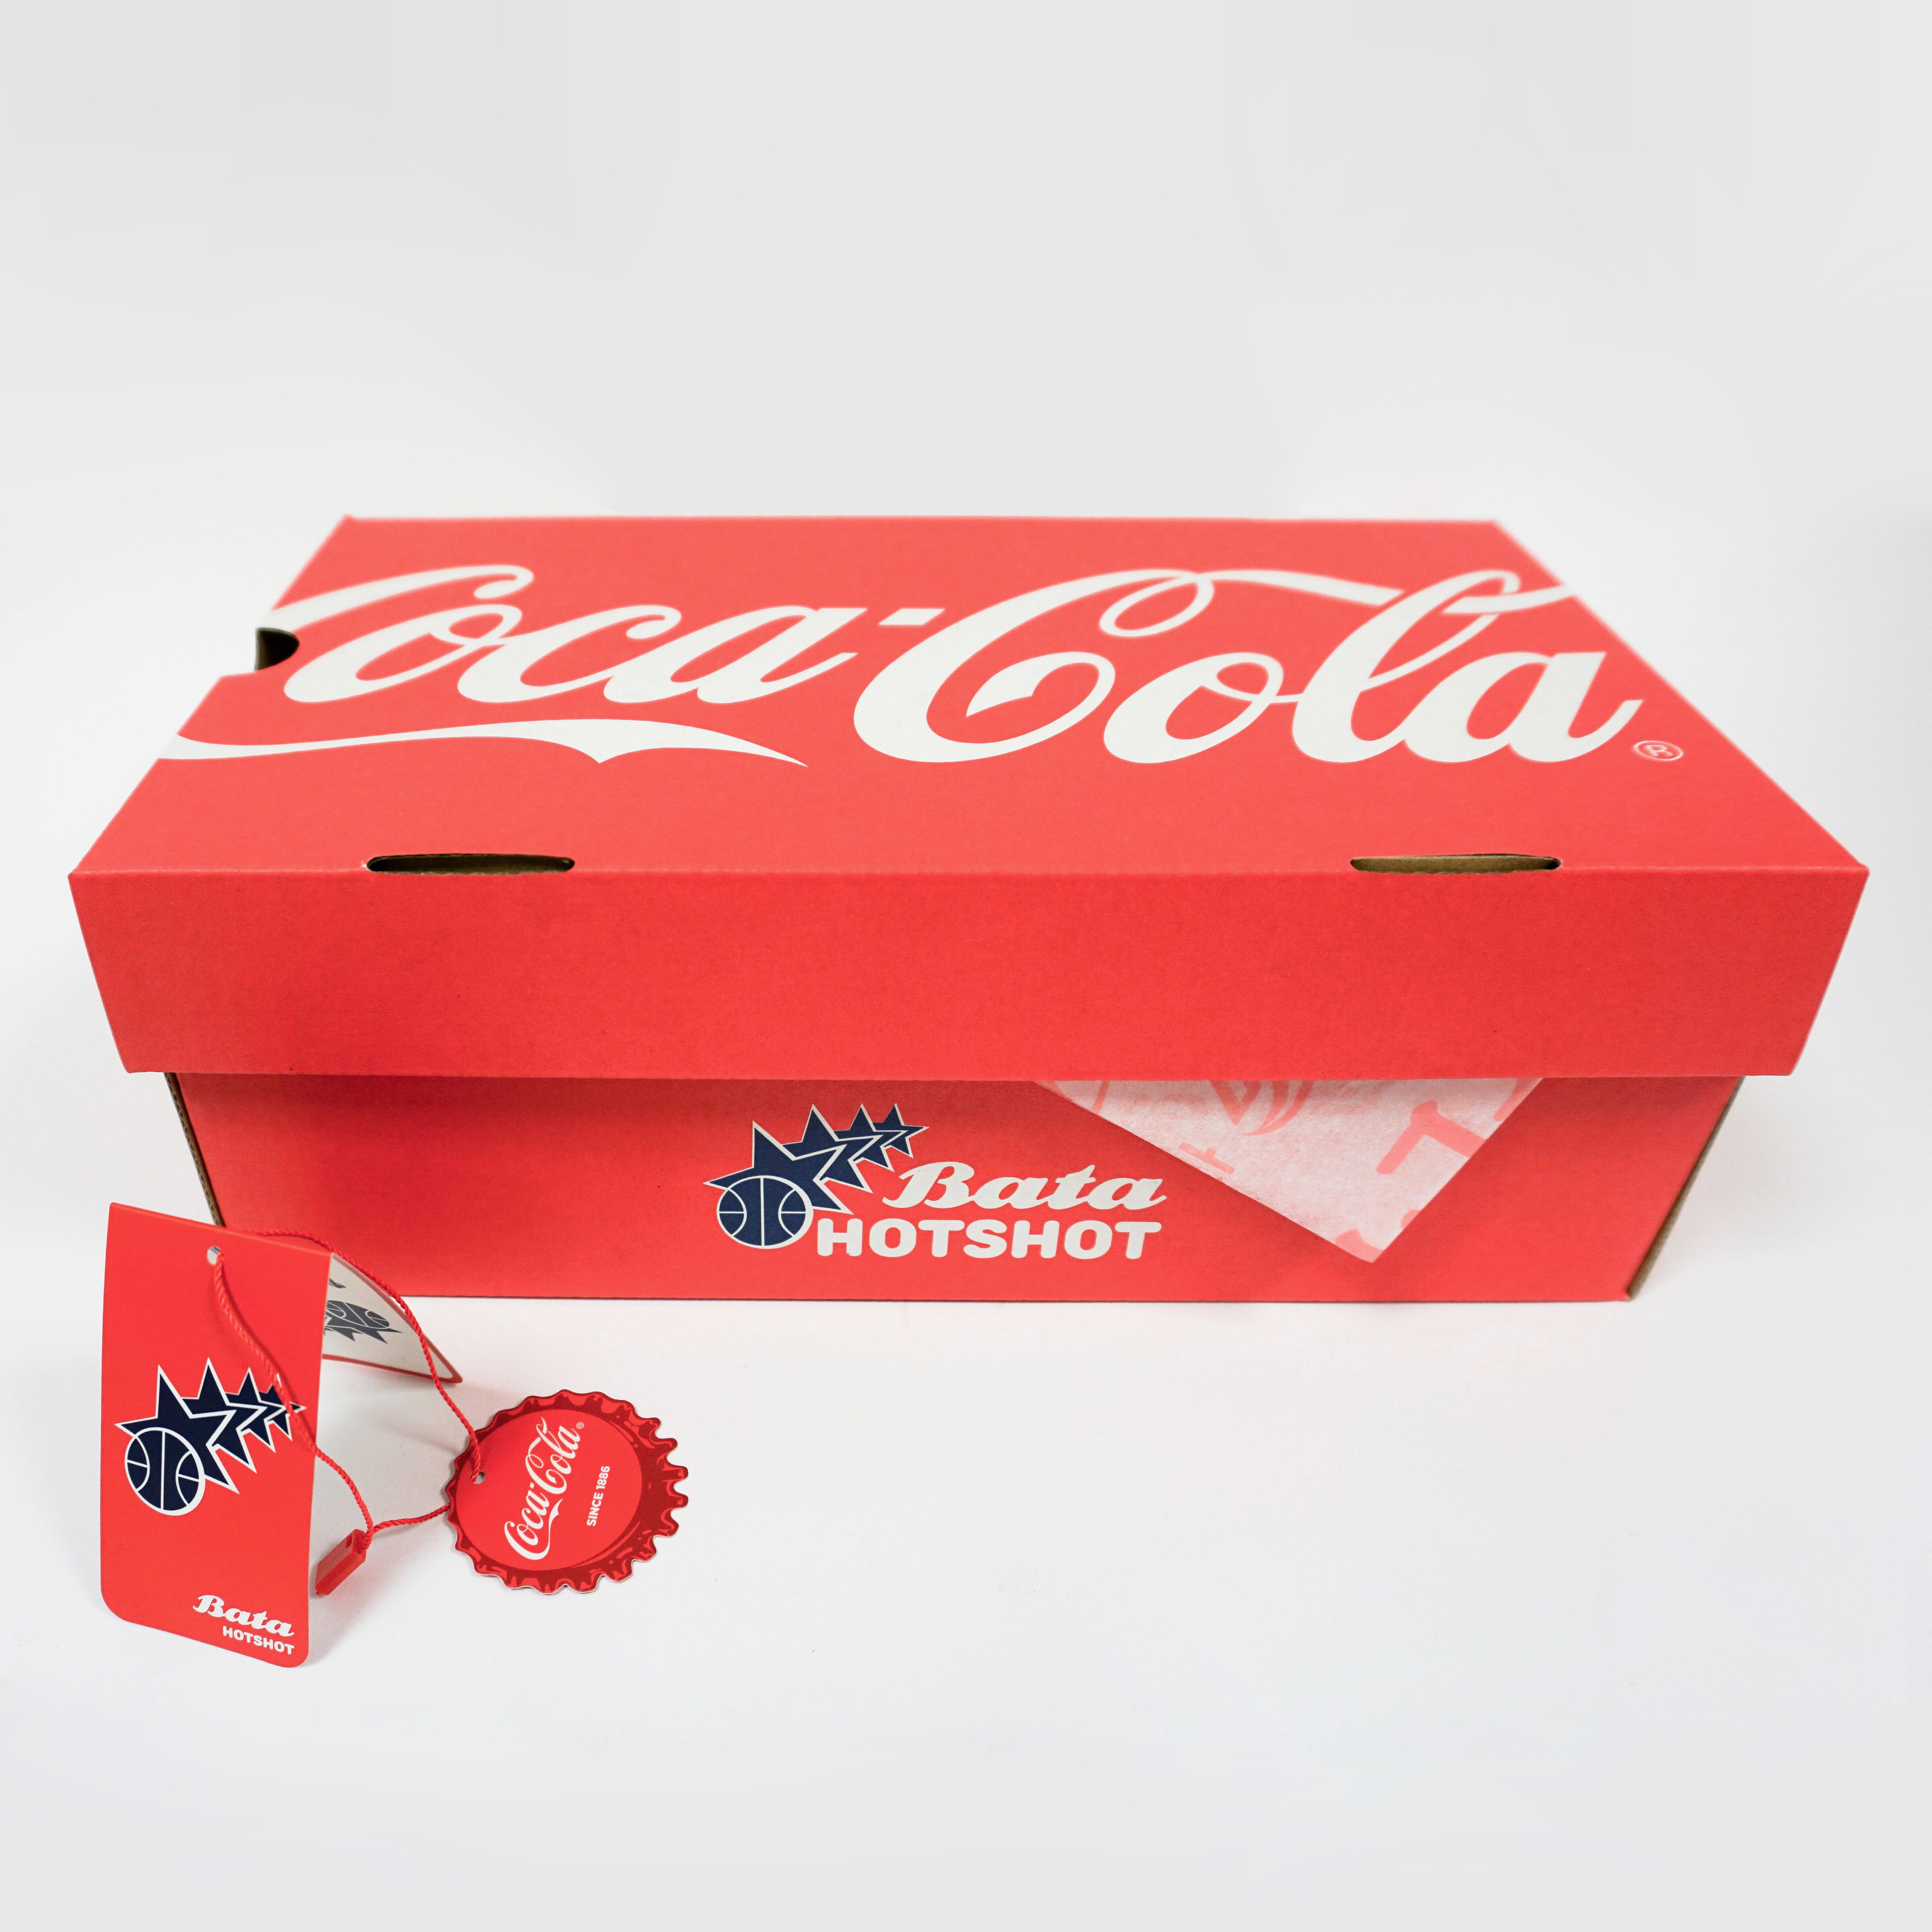 Pánské Coca-Cola tenisky s červenými detaily